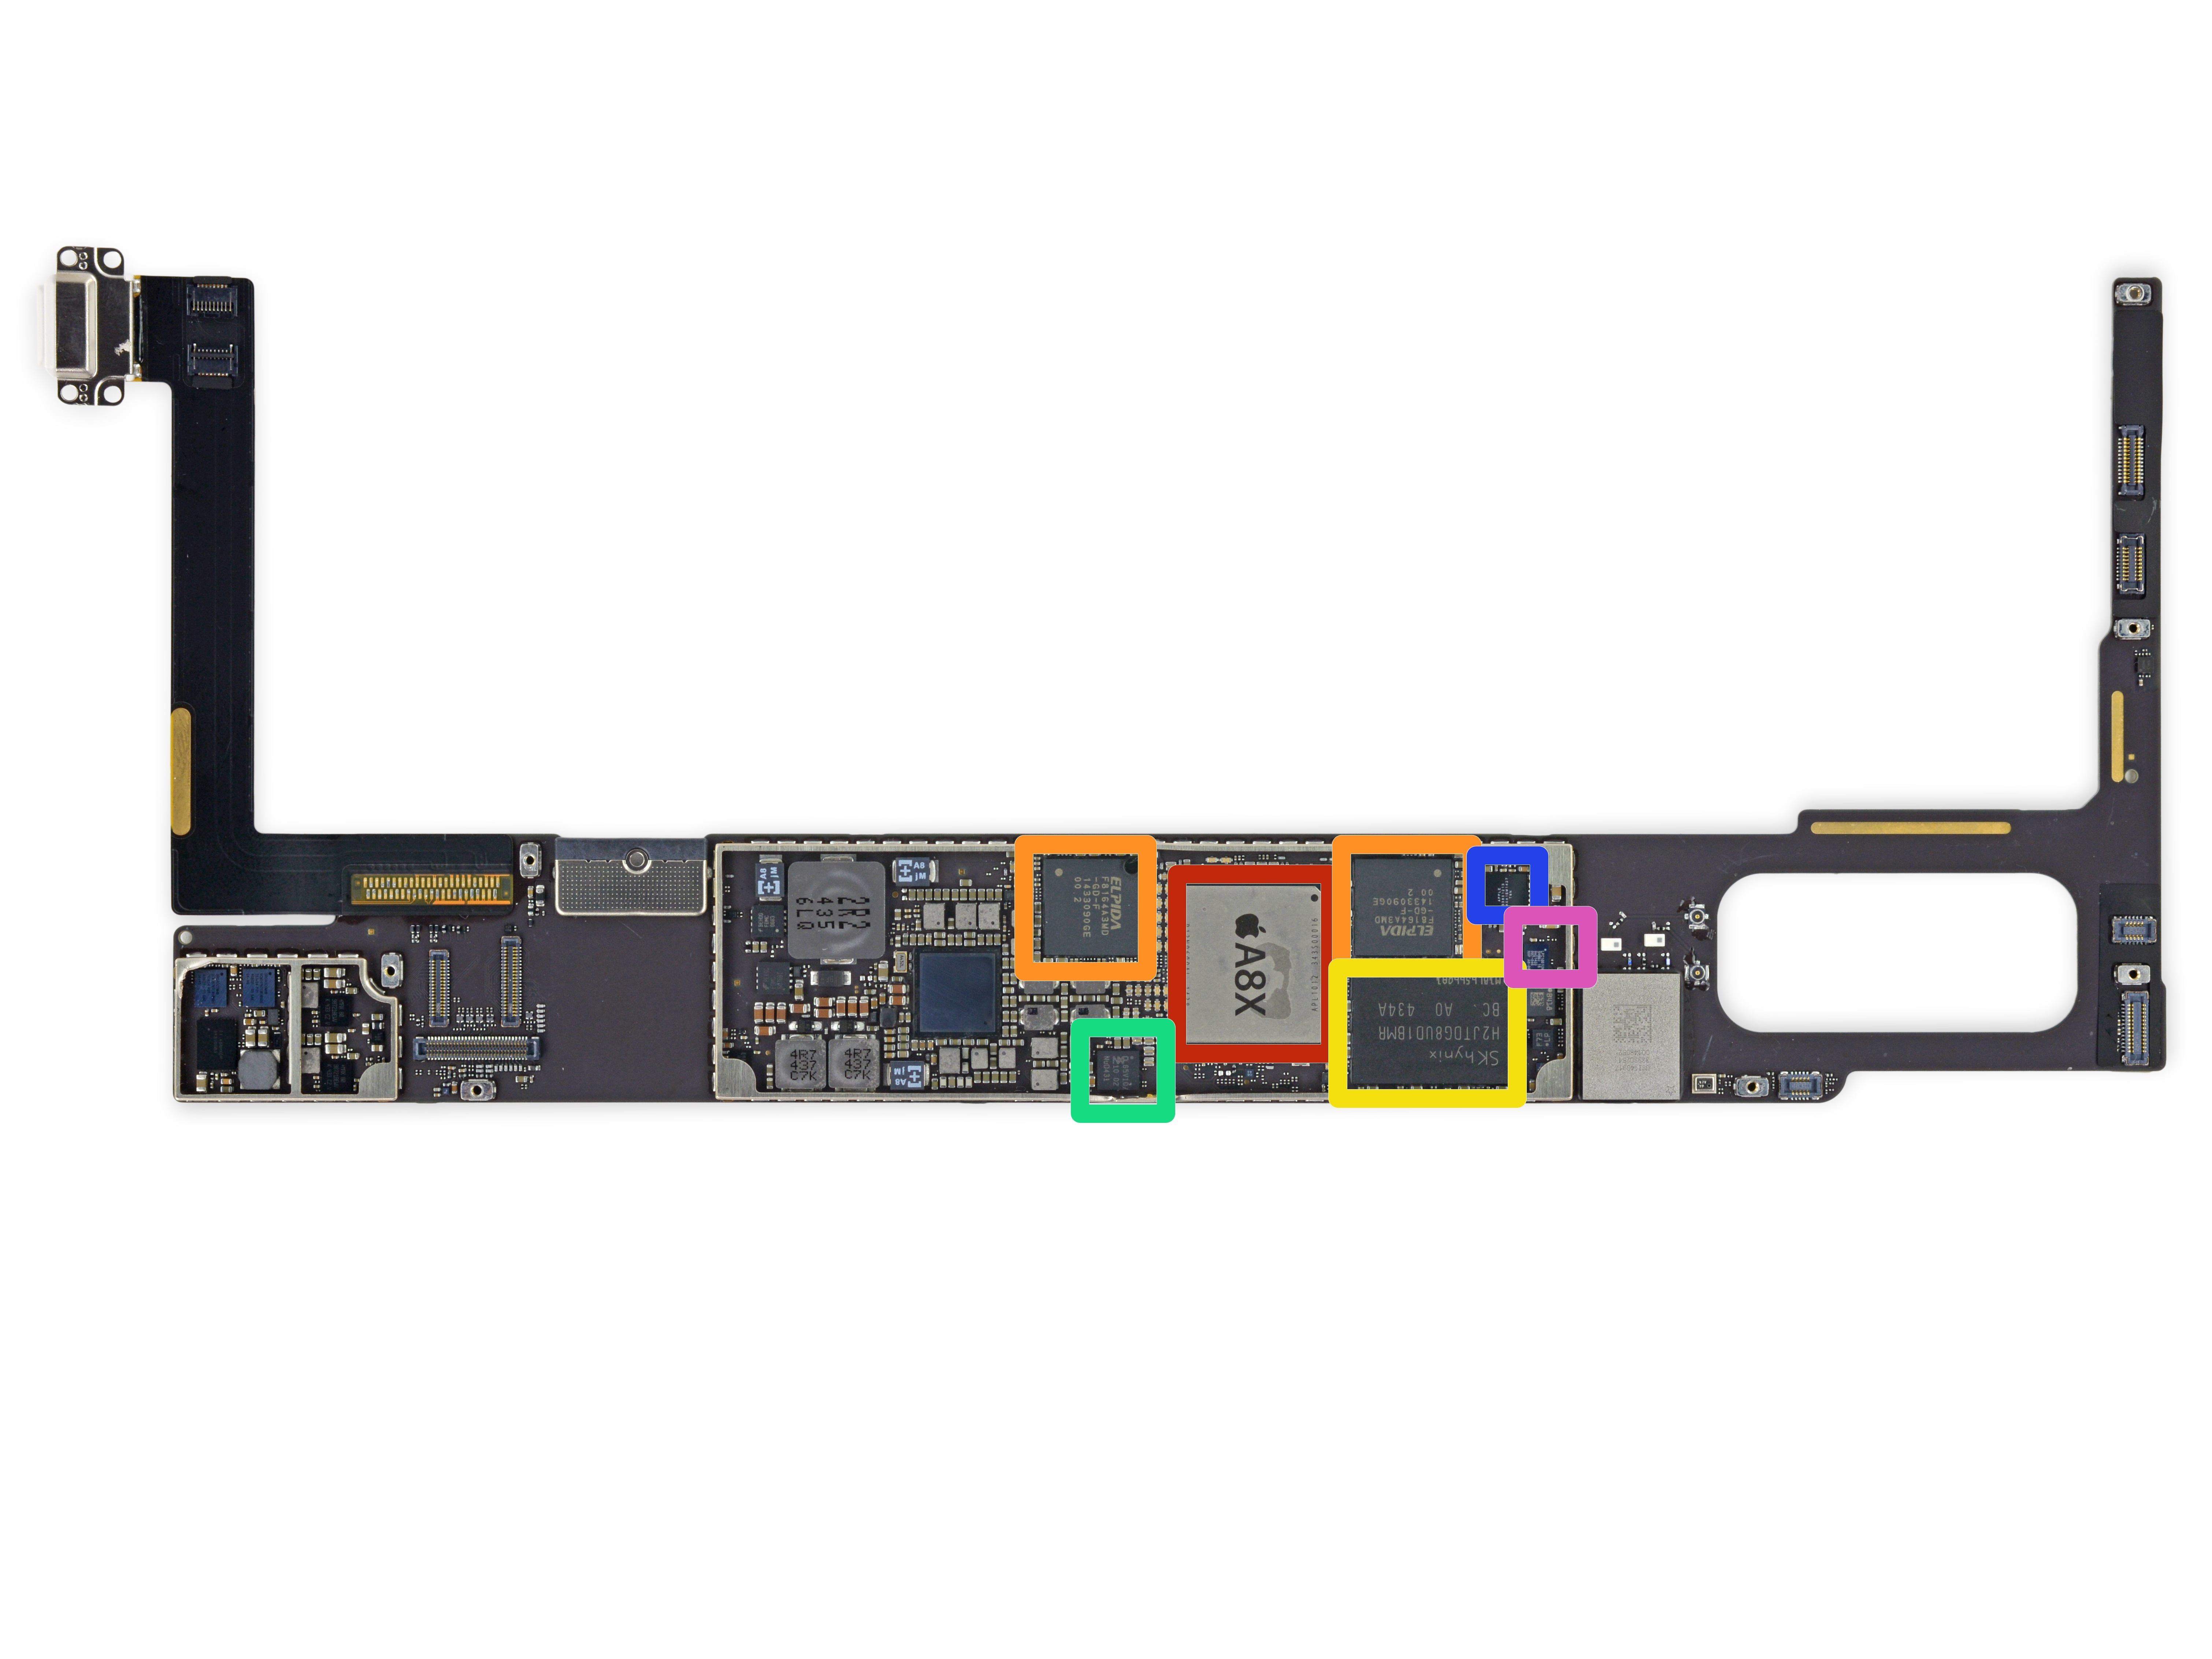 ipad air 2 design changes mean good and bad for ease of repair rh venturebeat com